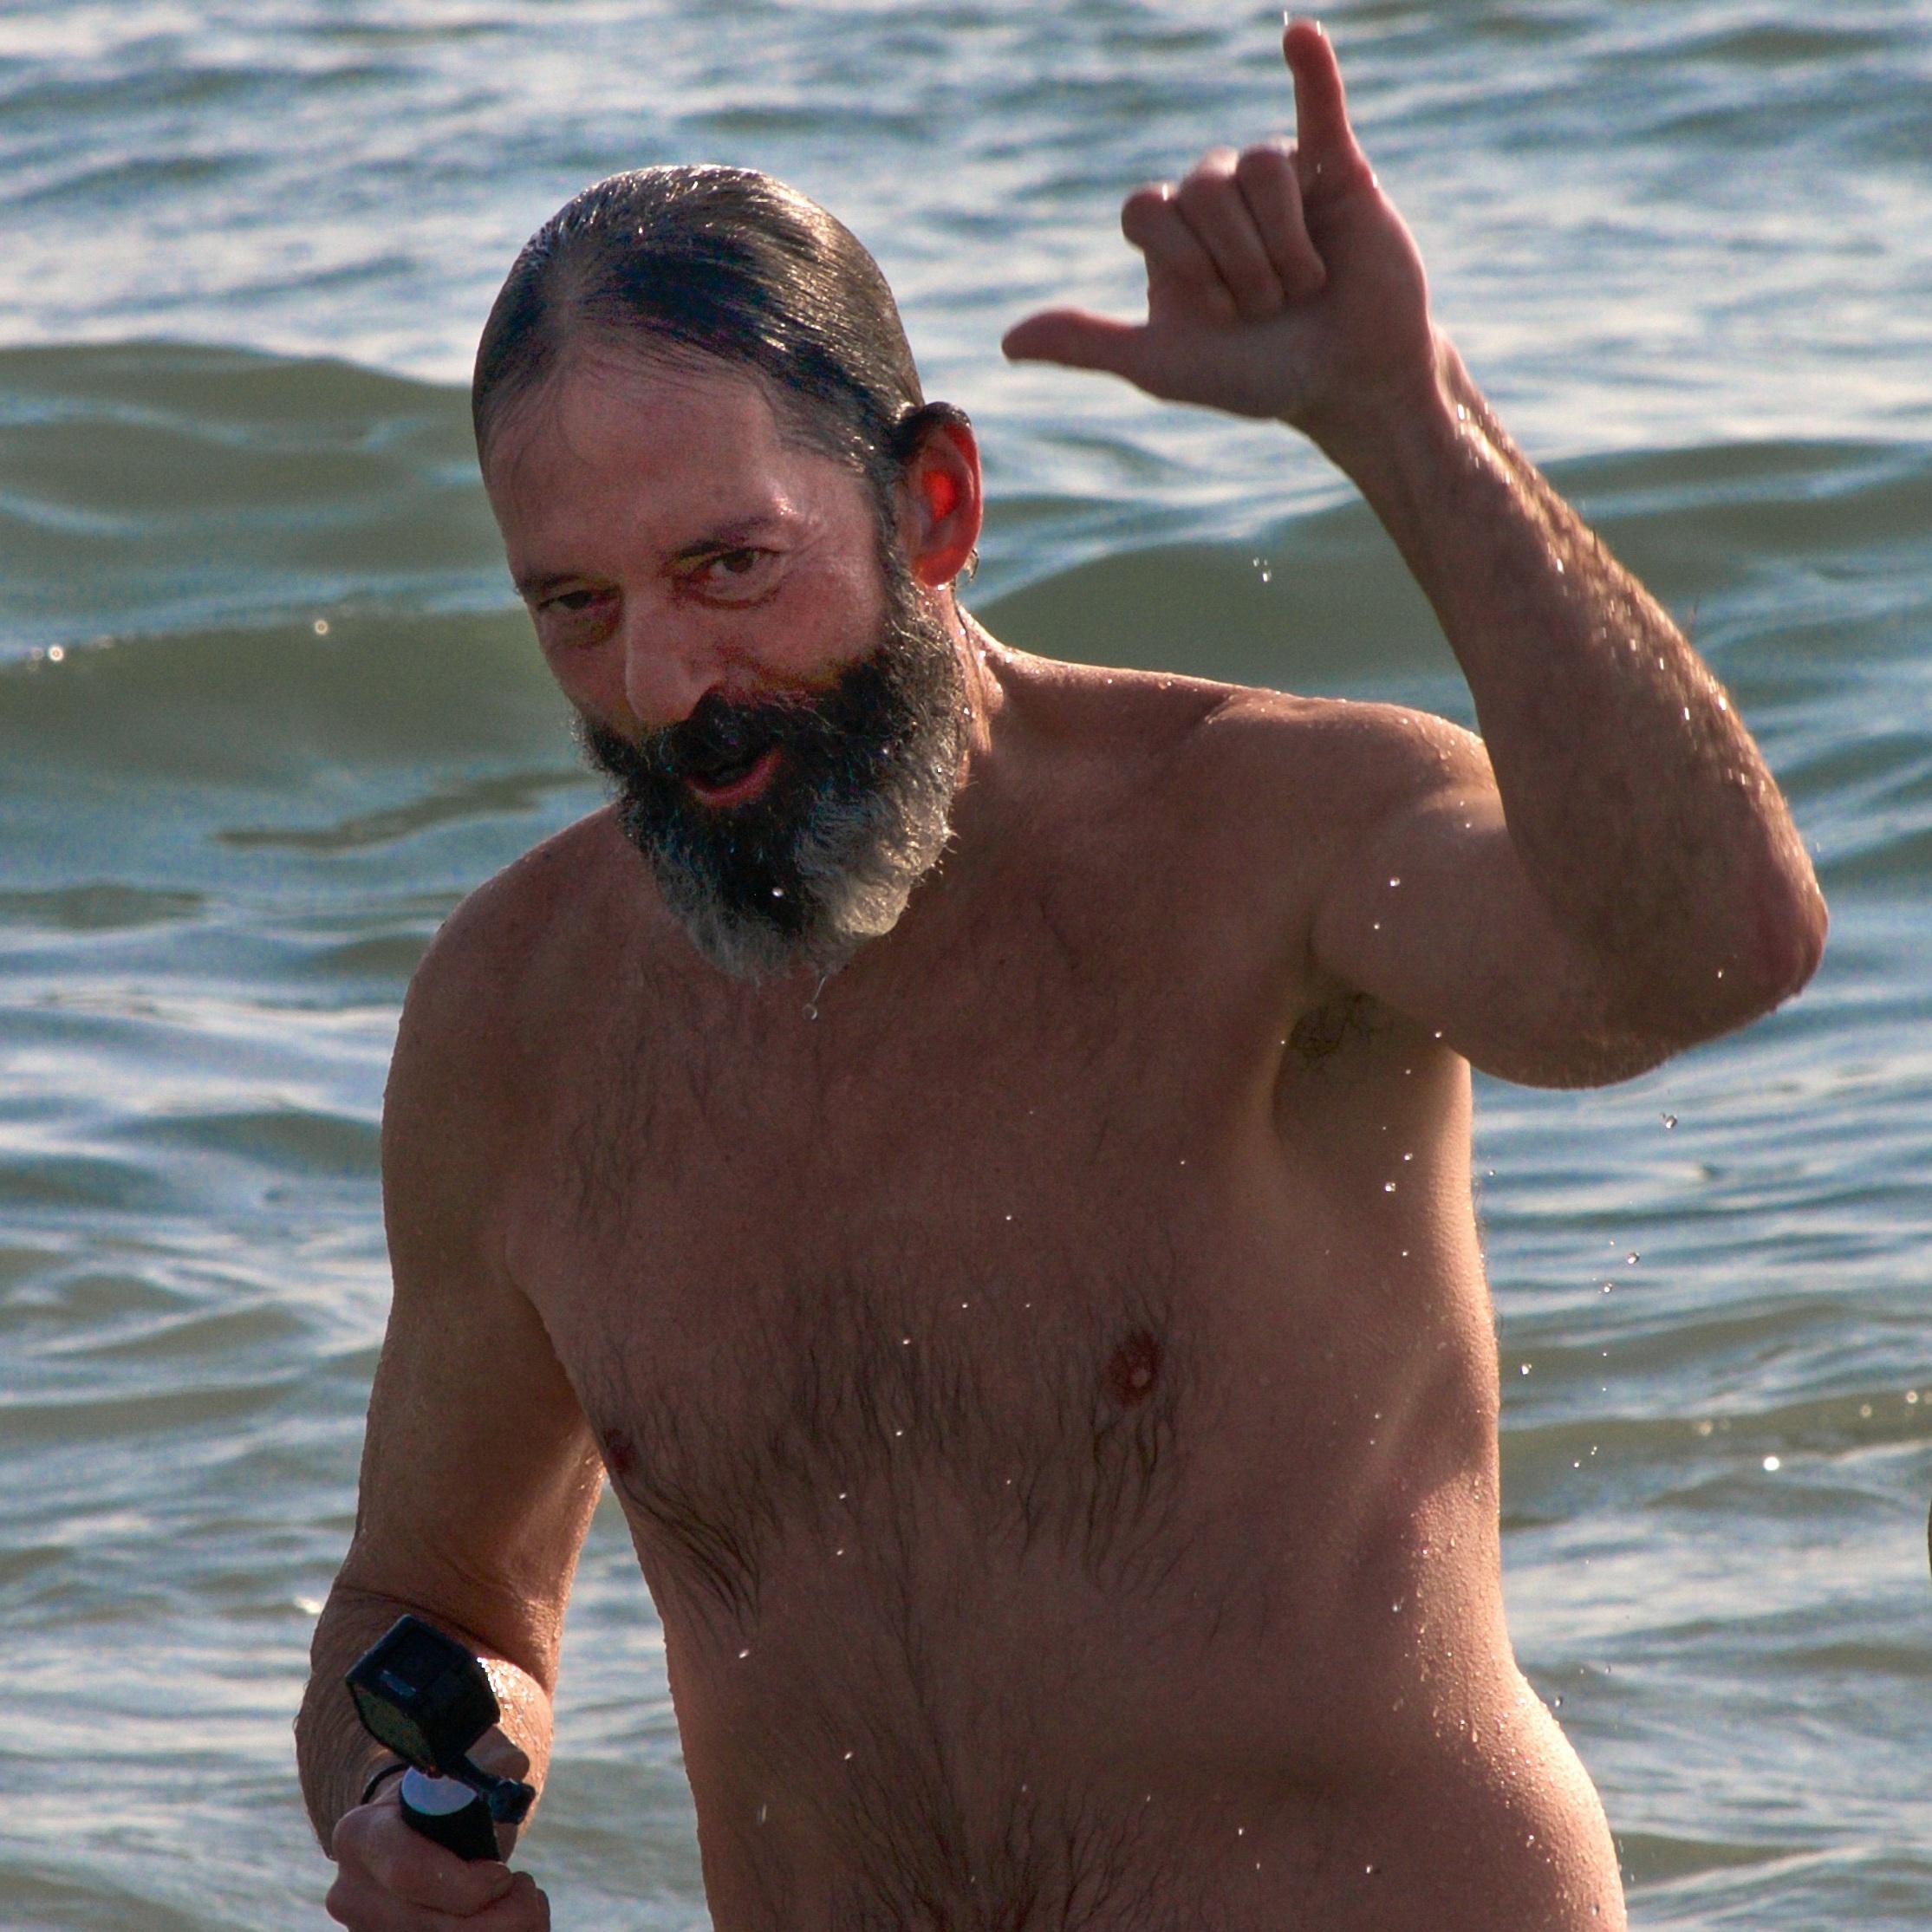 @ Long Beach Polar Bear Splash _older man_2.3.19-.jpg